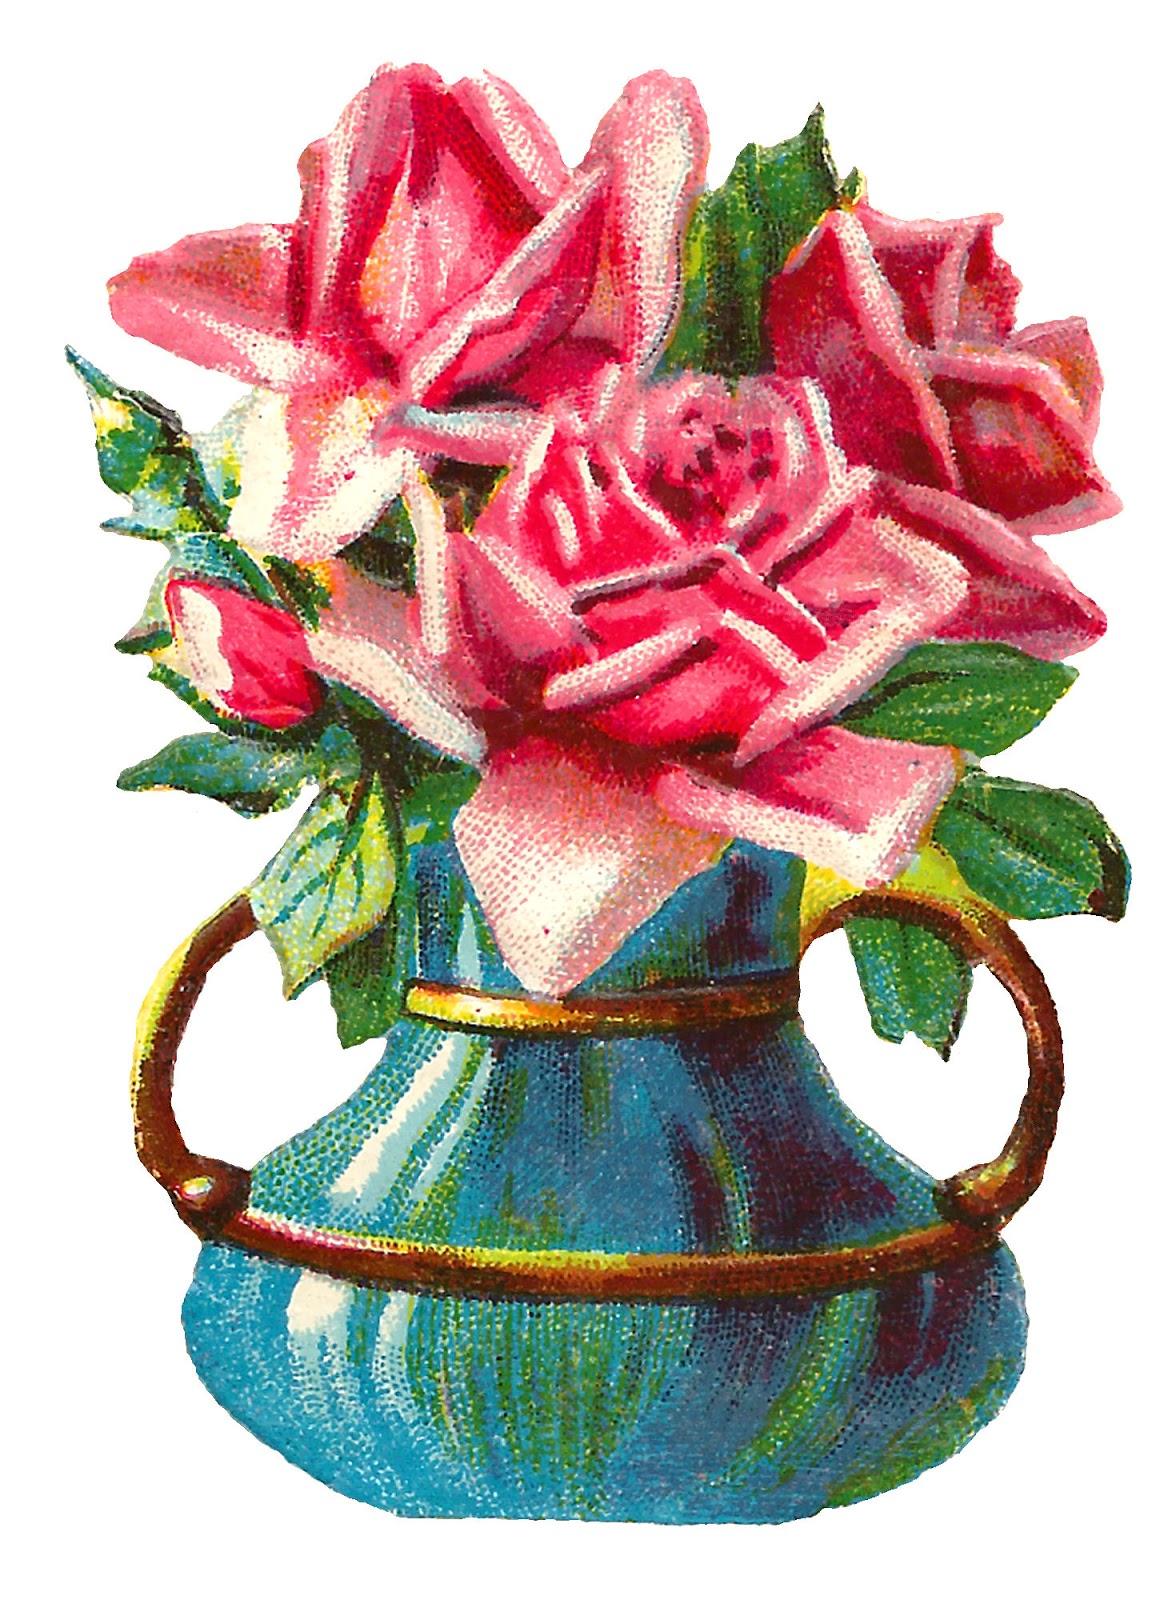 Antique Images: Shabby Chic Pink Rose Clip Art Flower Vase ...